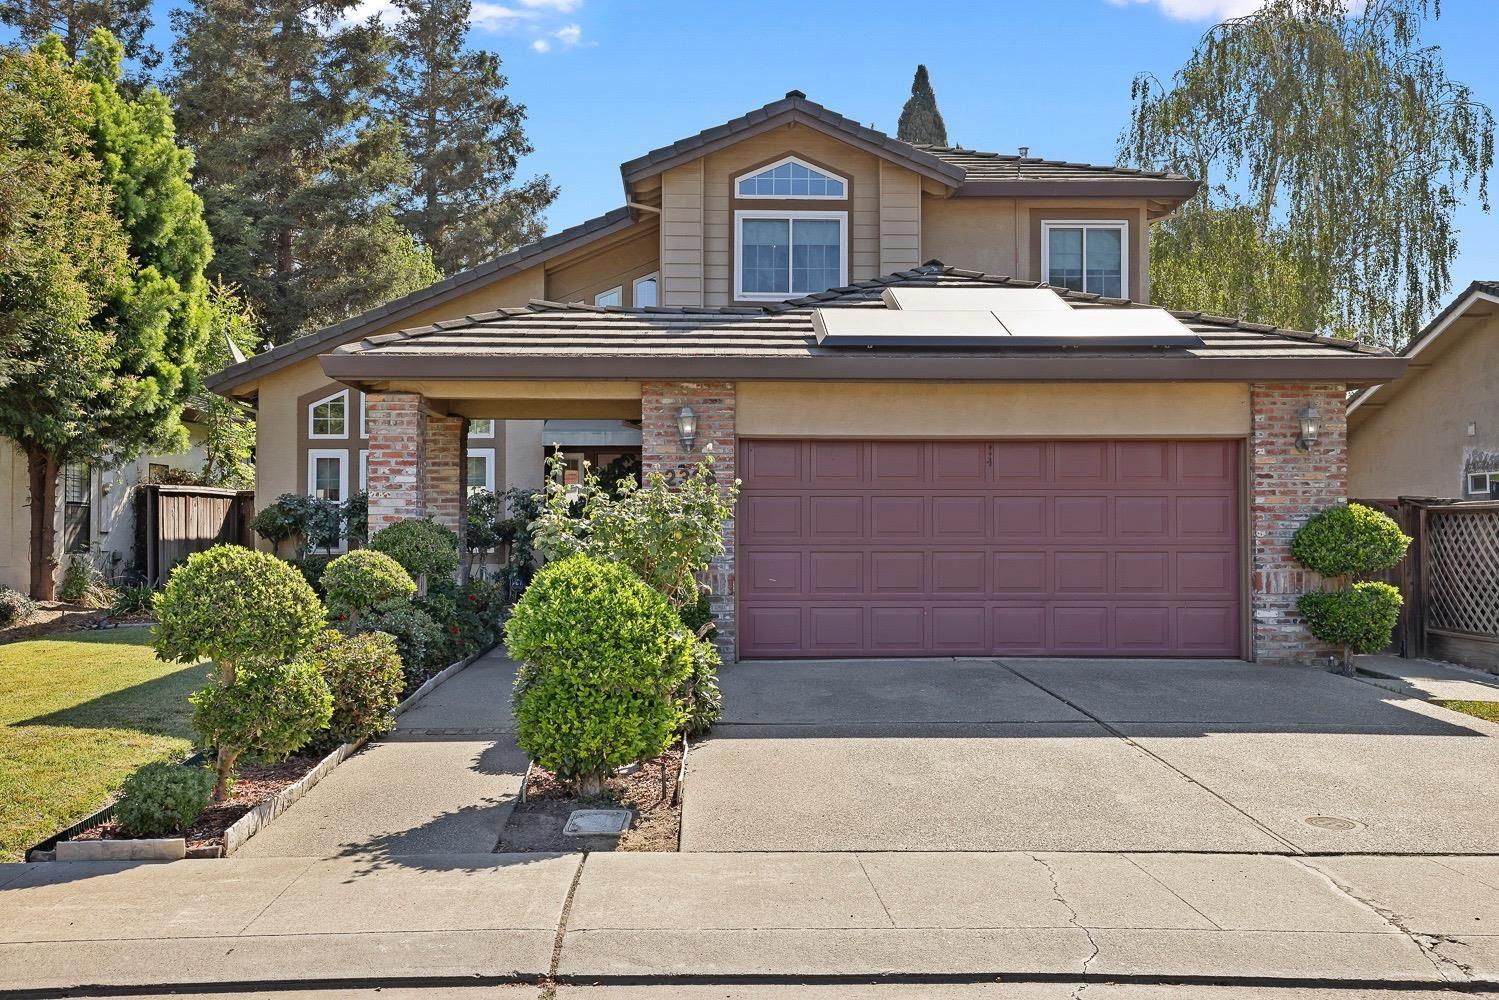 2326 Oregon Avenue, Stockton, CA 95204 - MLS#: 221066152